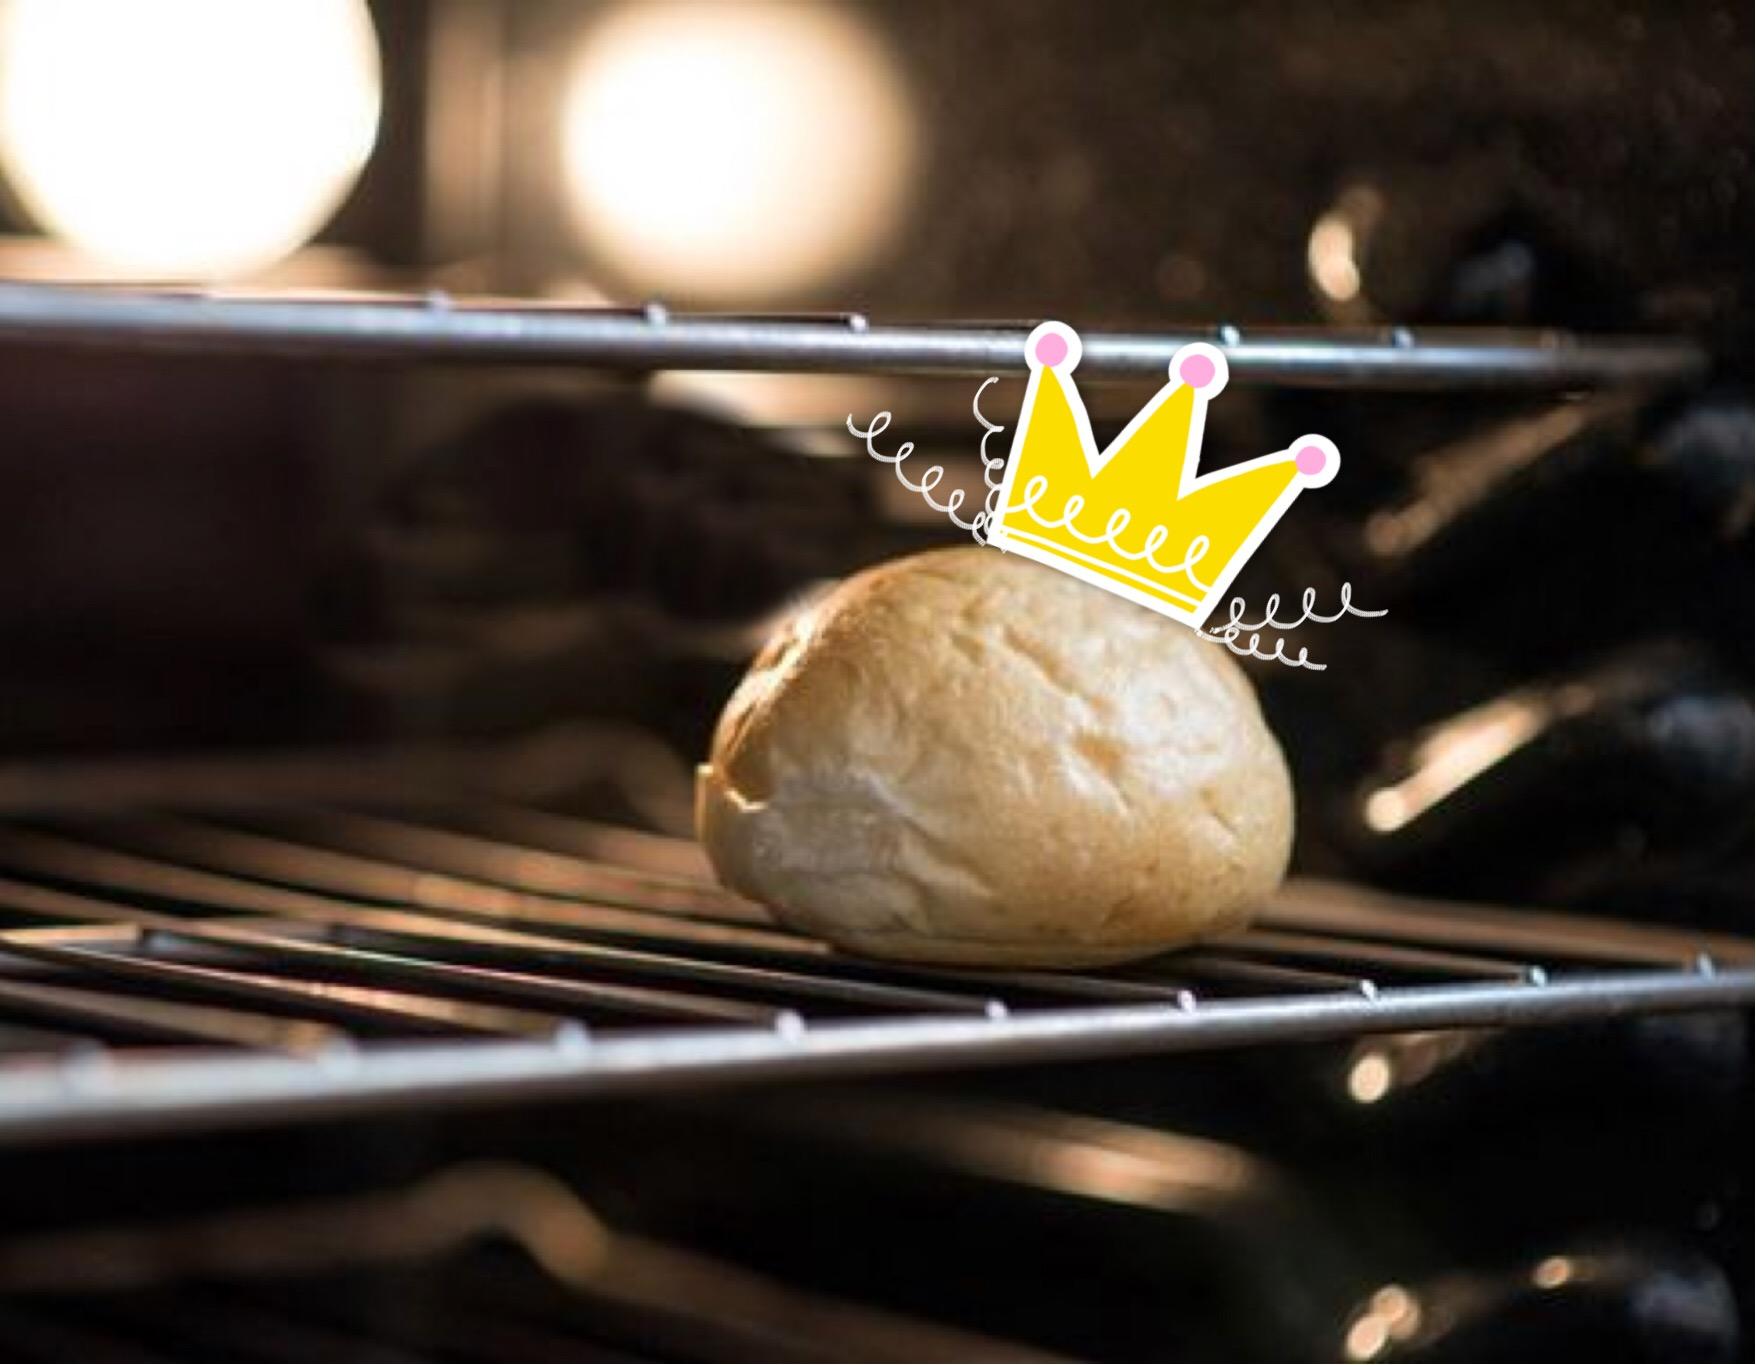 #bun #oven #freetoedit